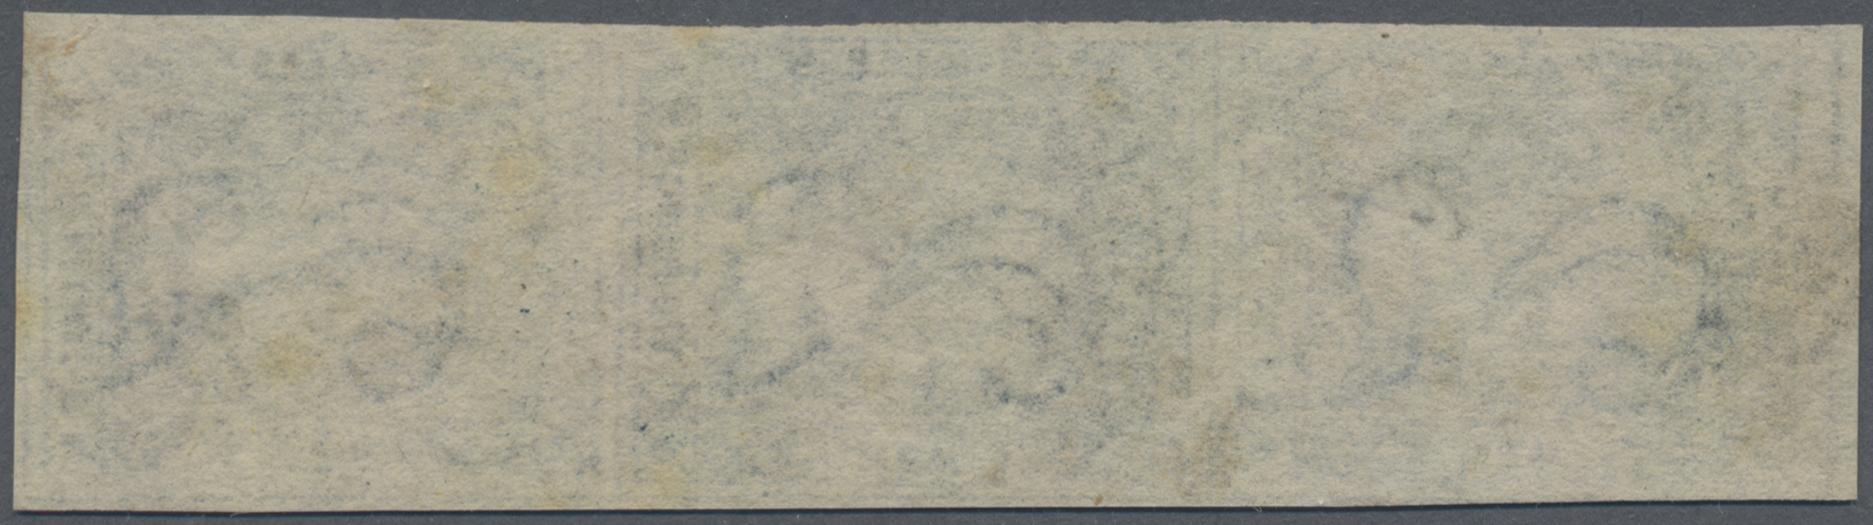 Lot 03001 - neusüdwales  -  Auktionshaus Christoph Gärtner GmbH & Co. KG Sale #49 Special catalogue Australia, USA – Wells Fargo